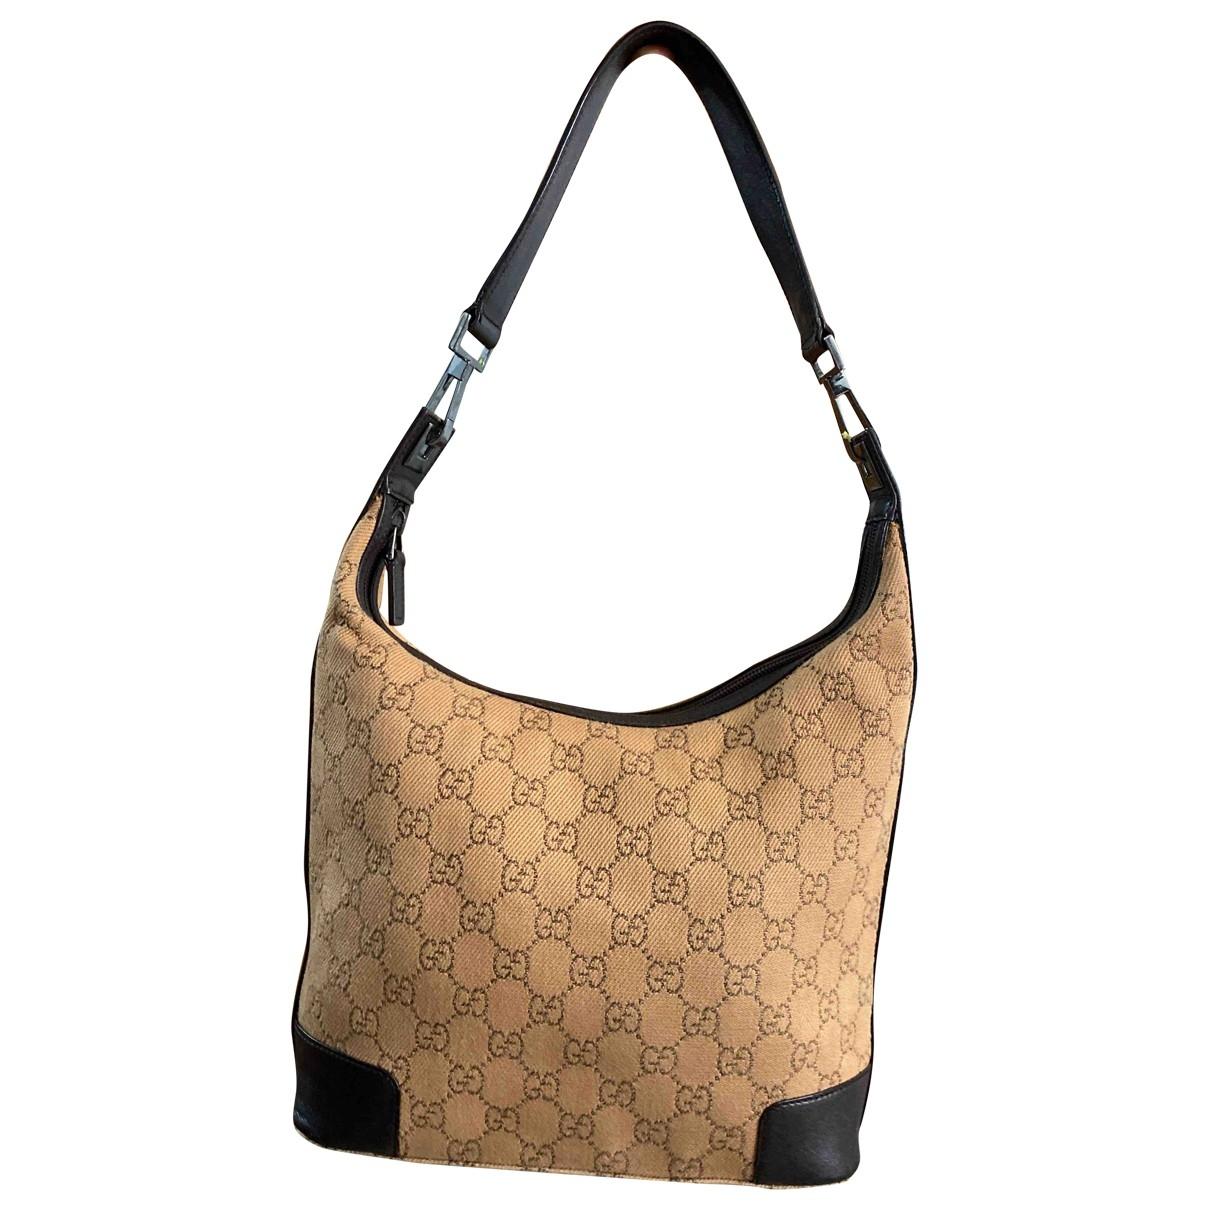 Gucci Hobo Handtasche in Leinen